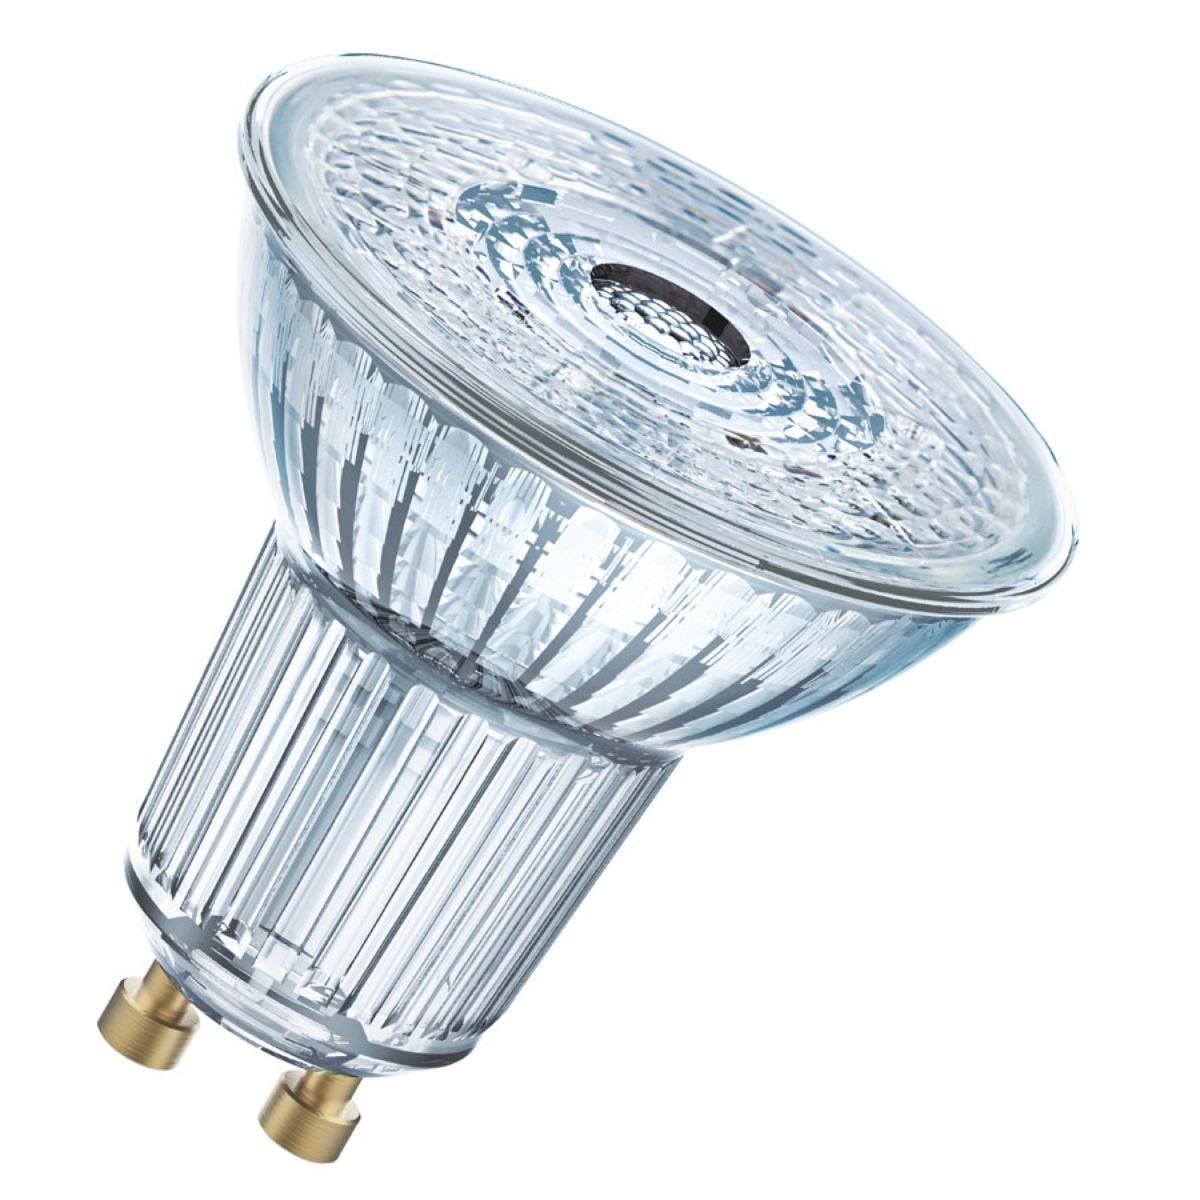 Osram Clear 50W Equivalent LED GU10 Bulbs, Warm White - 3 Pack